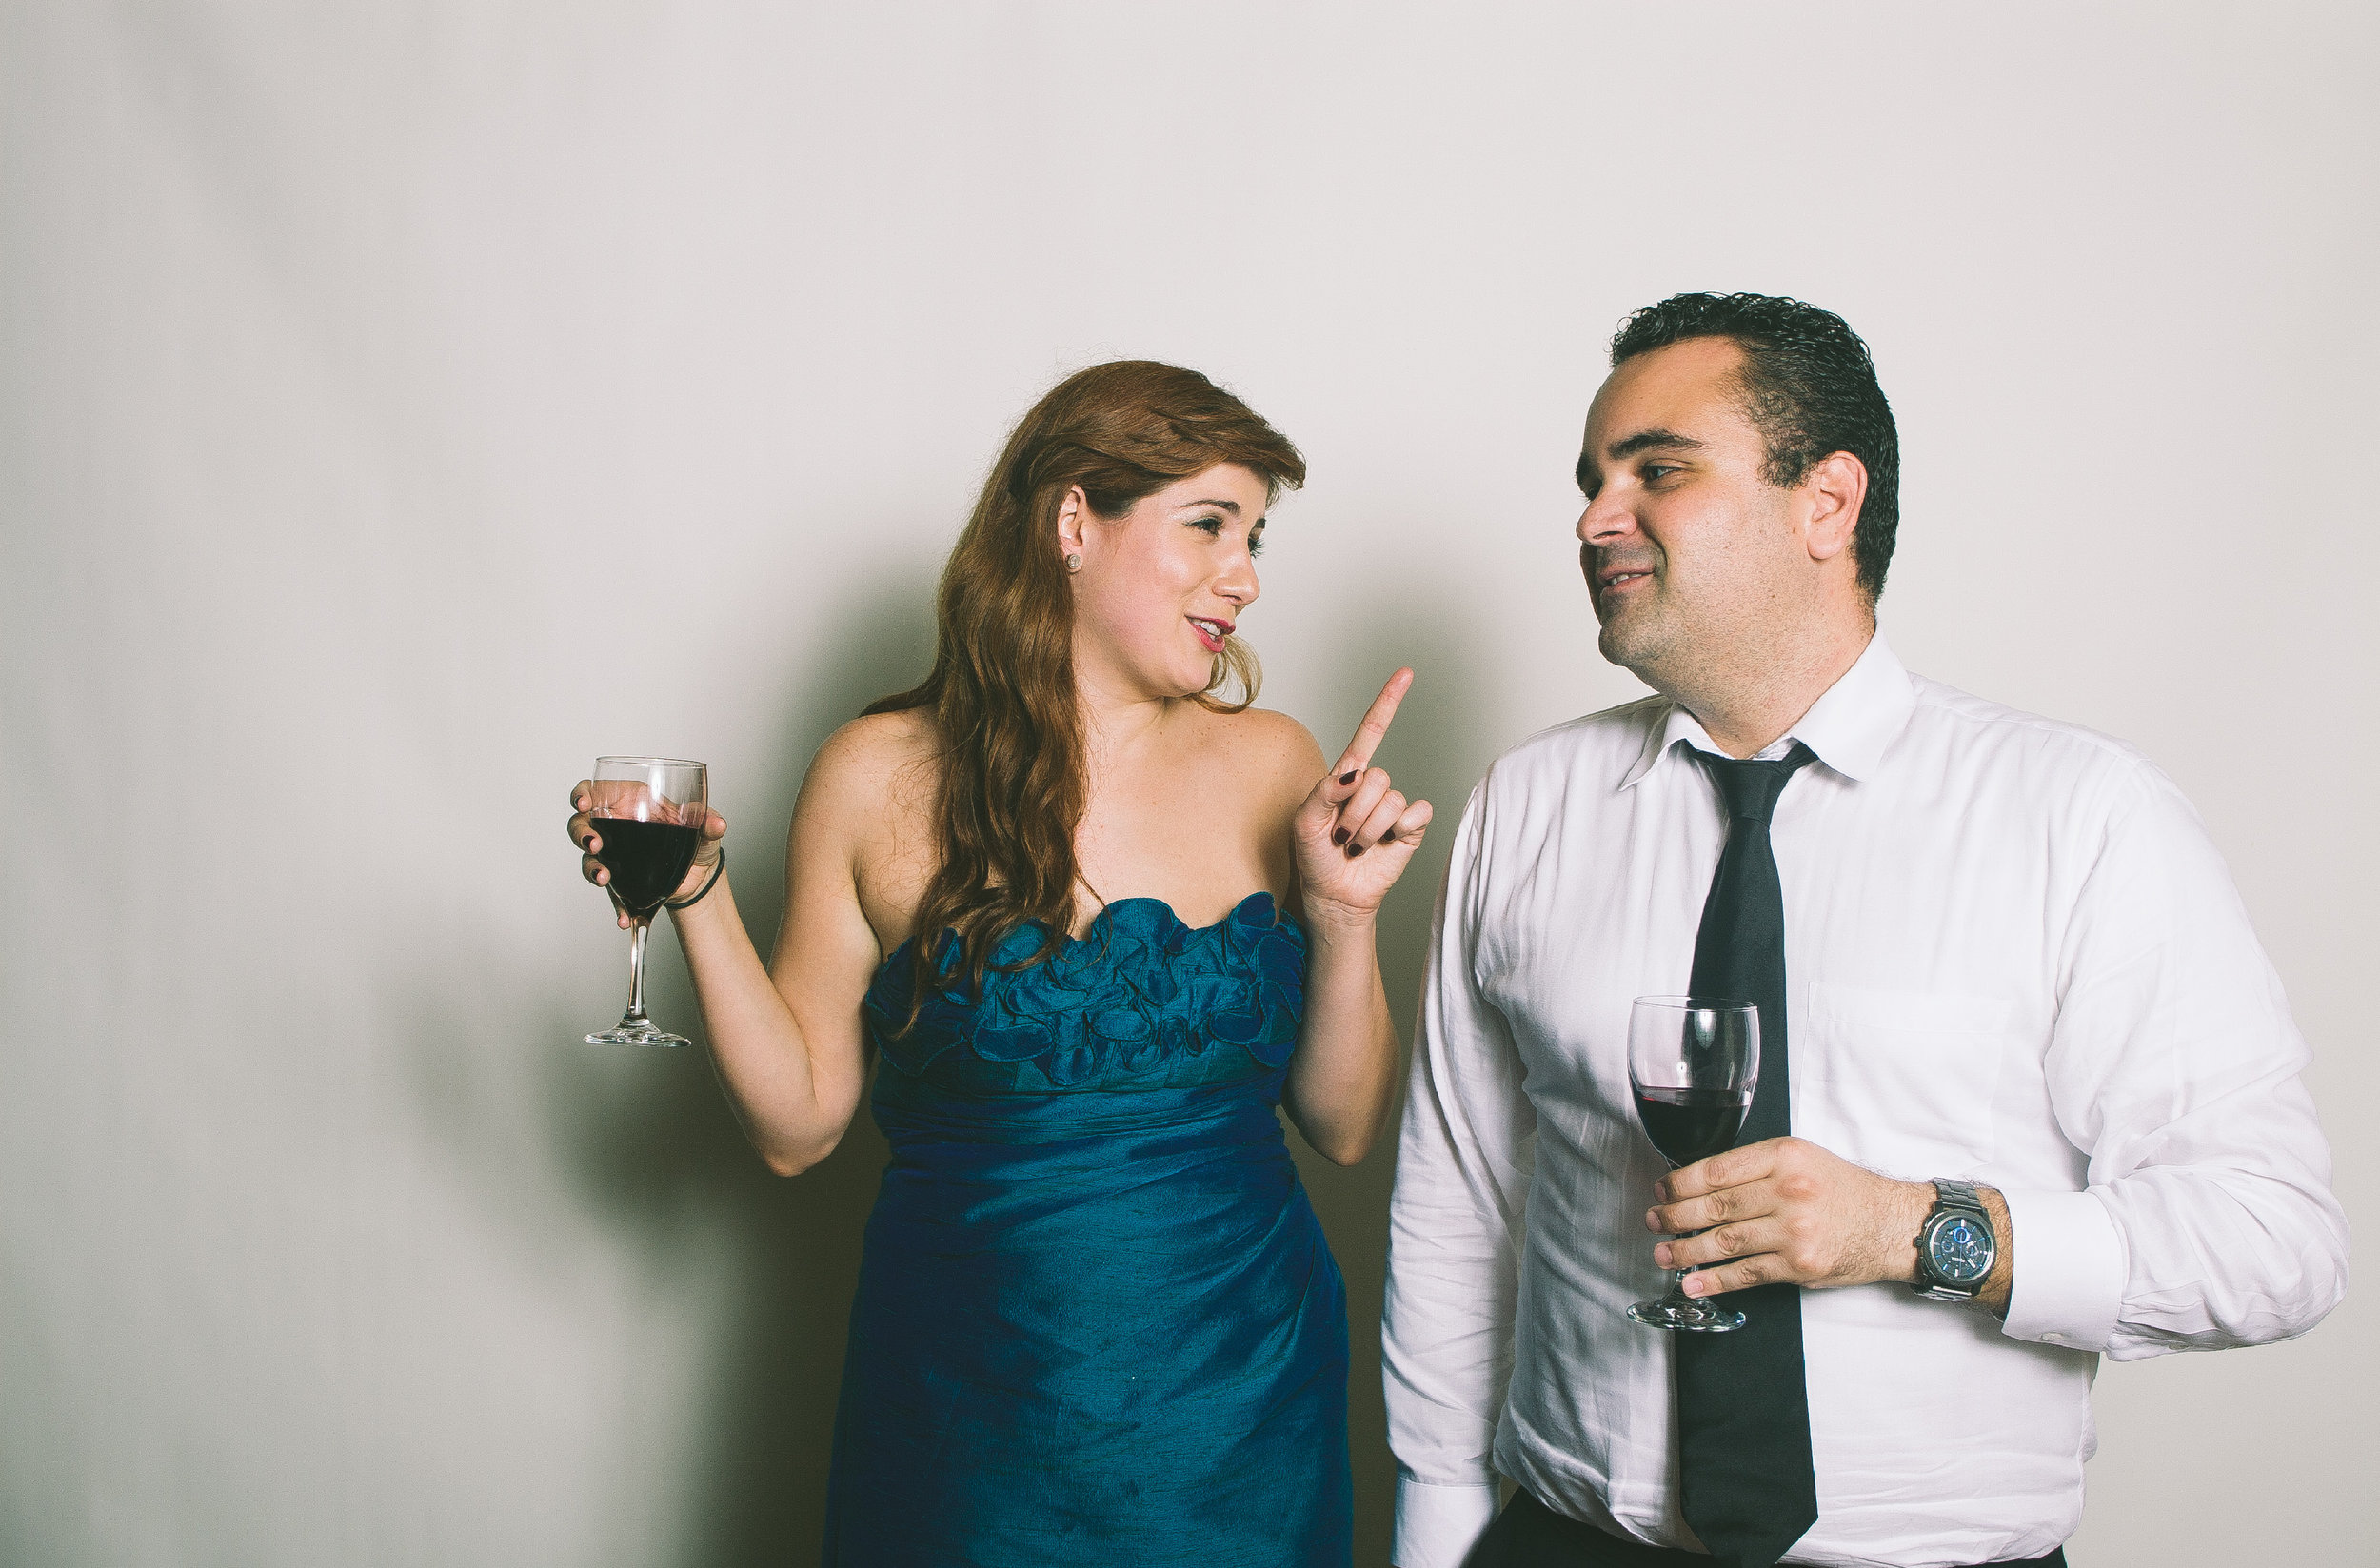 Marelys + Oscar Wedding Wackybooth Photobooth6.jpg